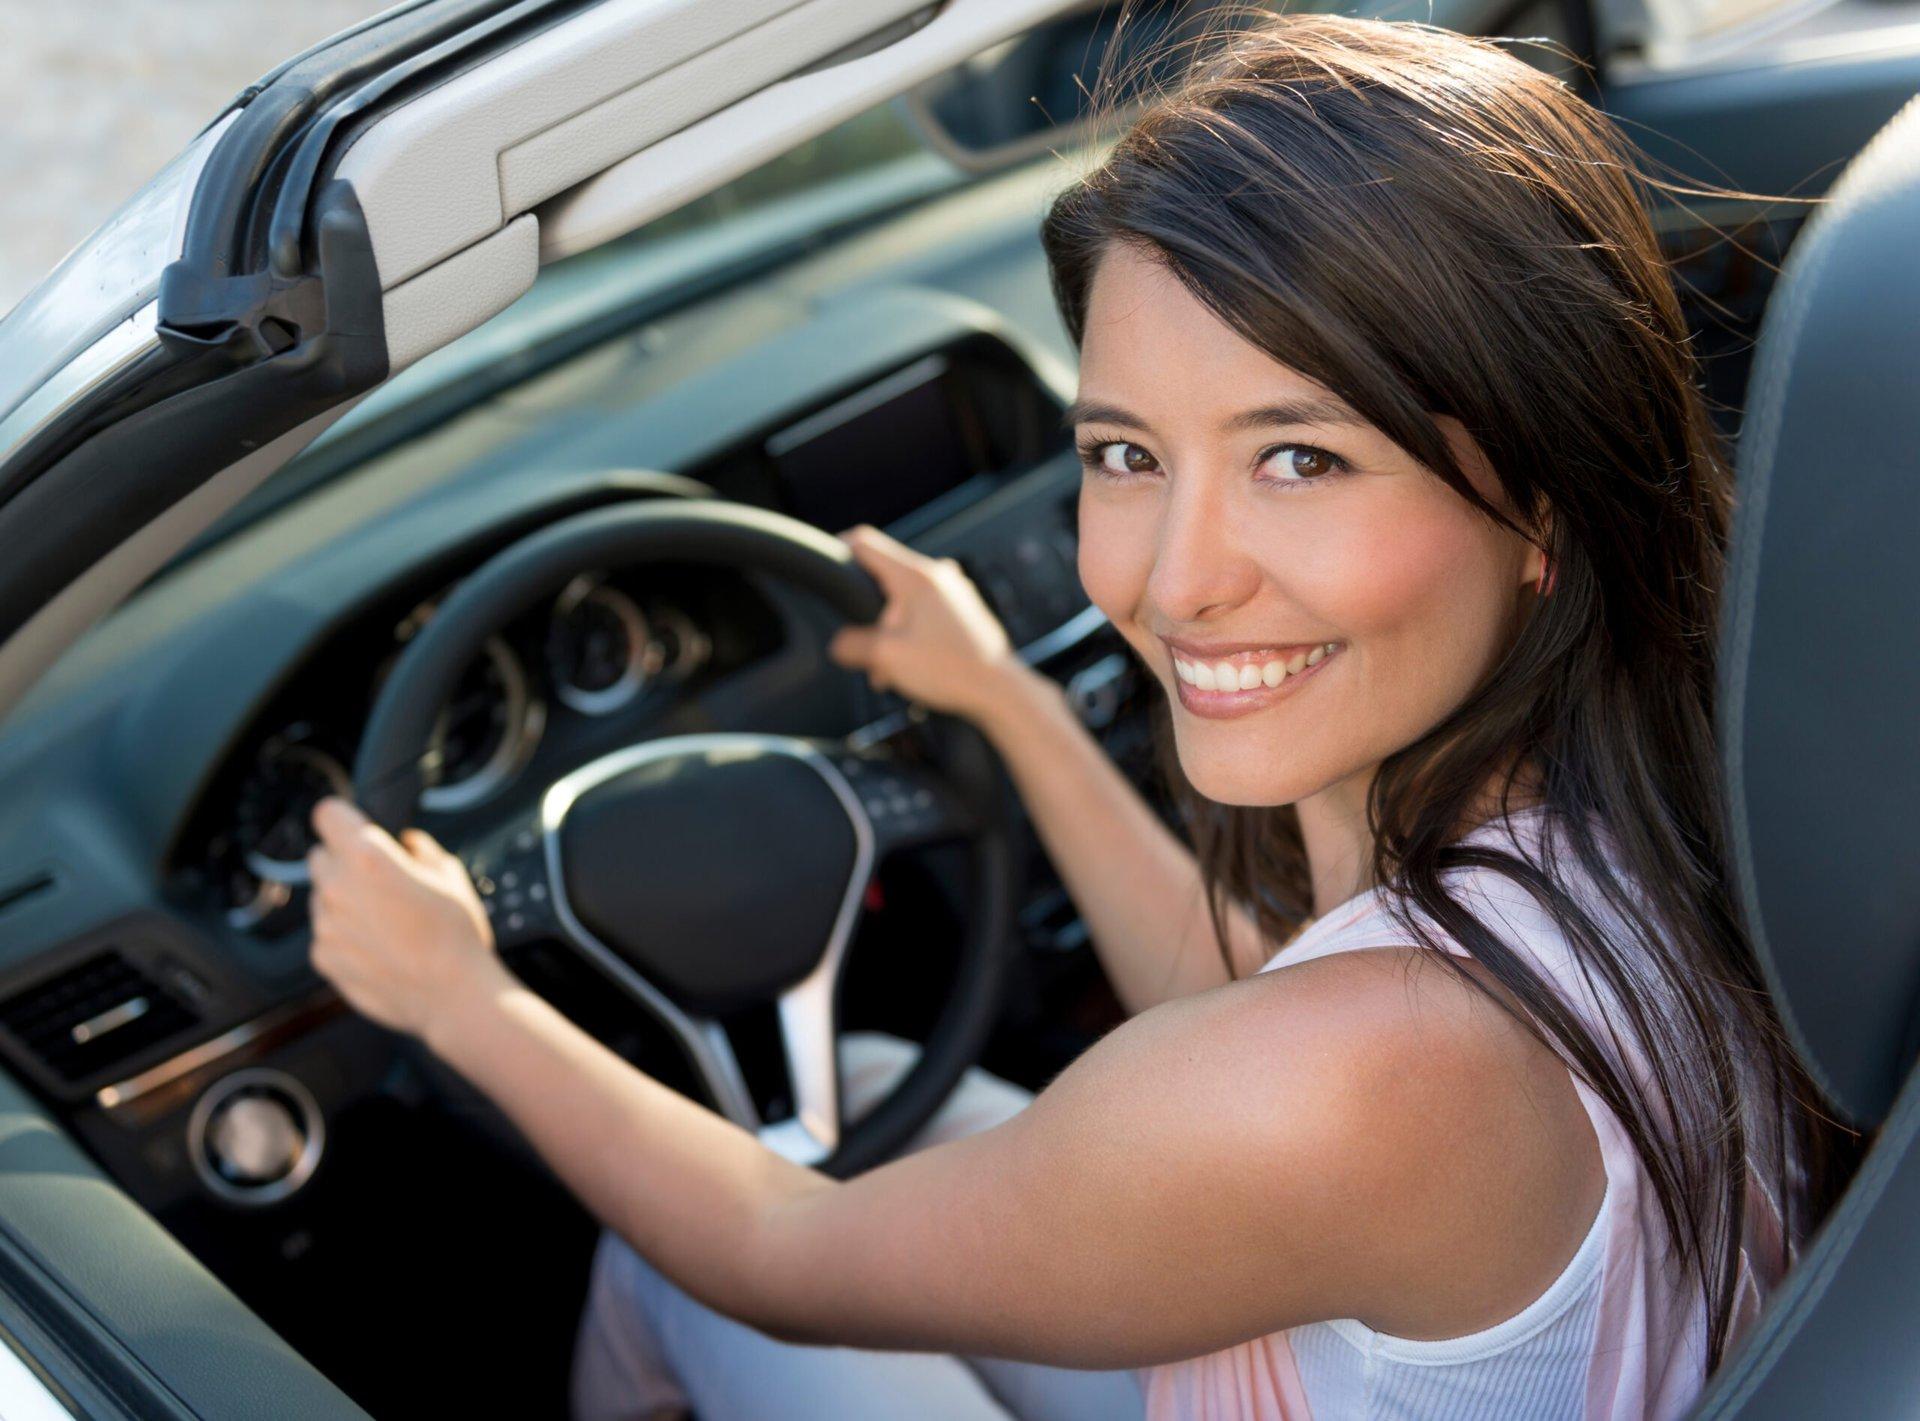 Smiling female driver